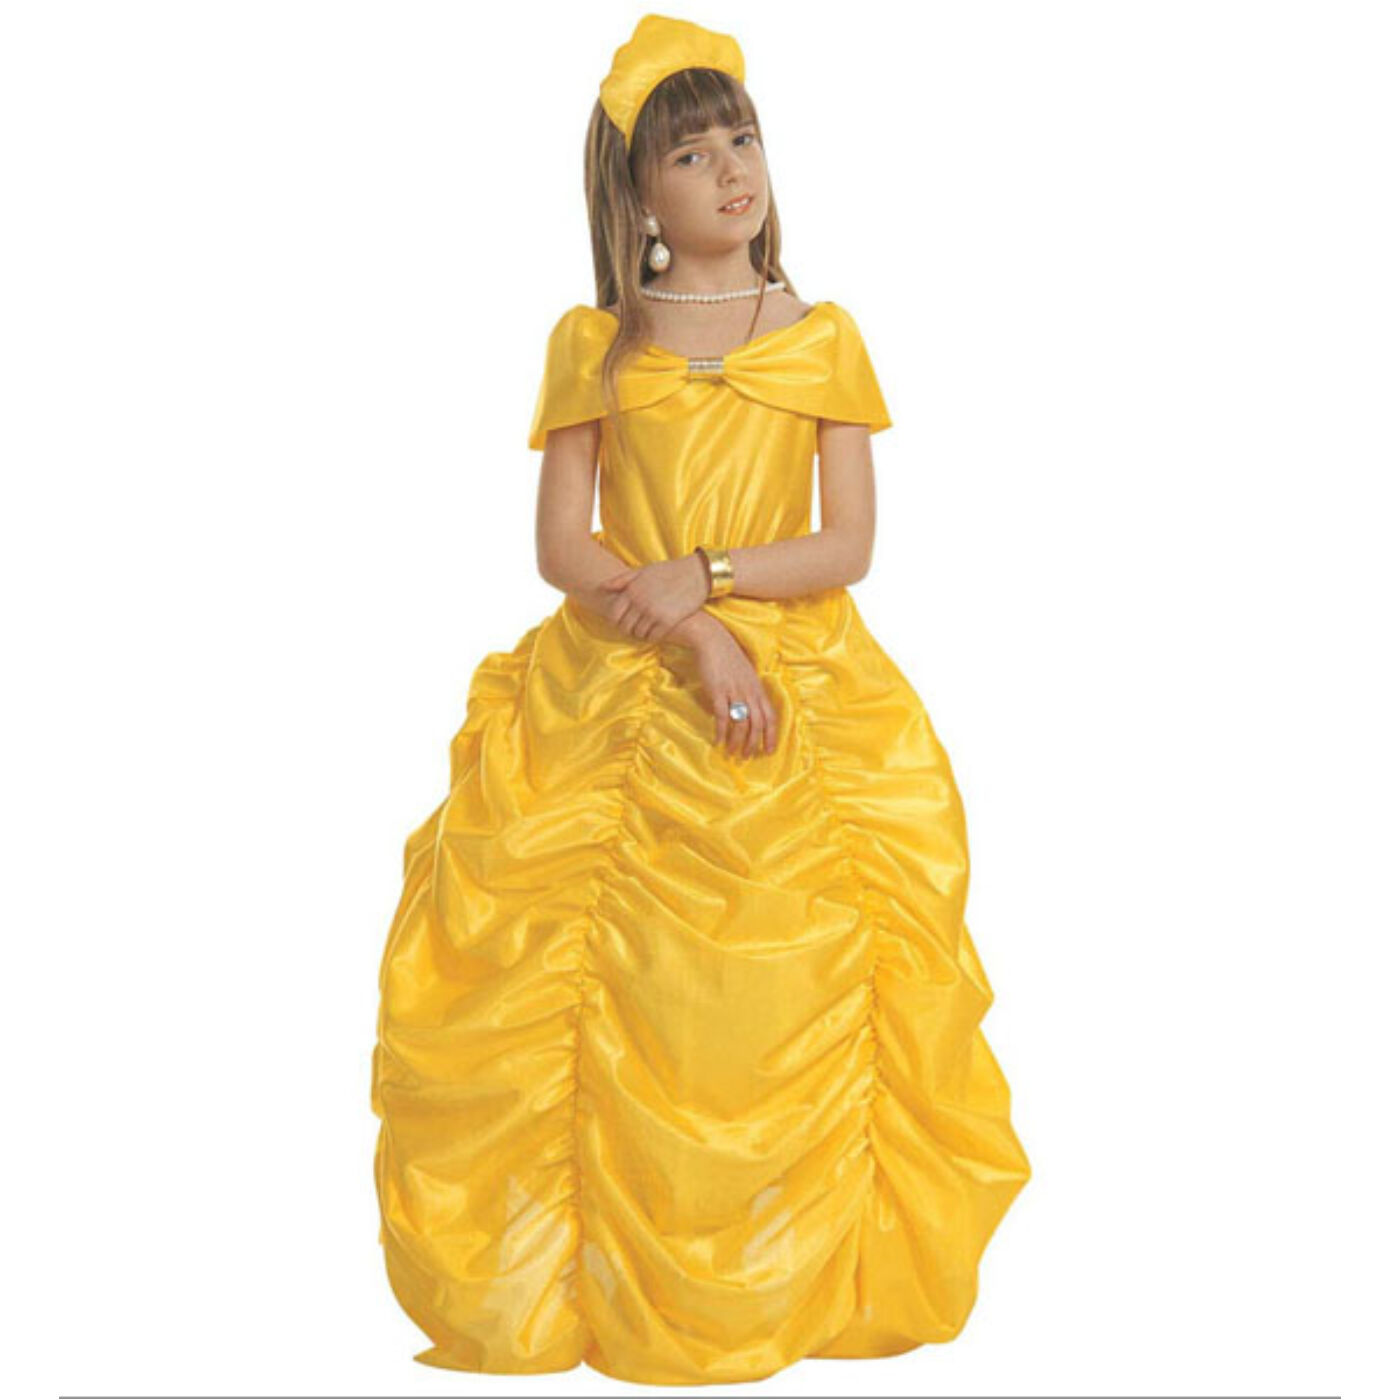 Sárga hercegnő Jelmez 128-as